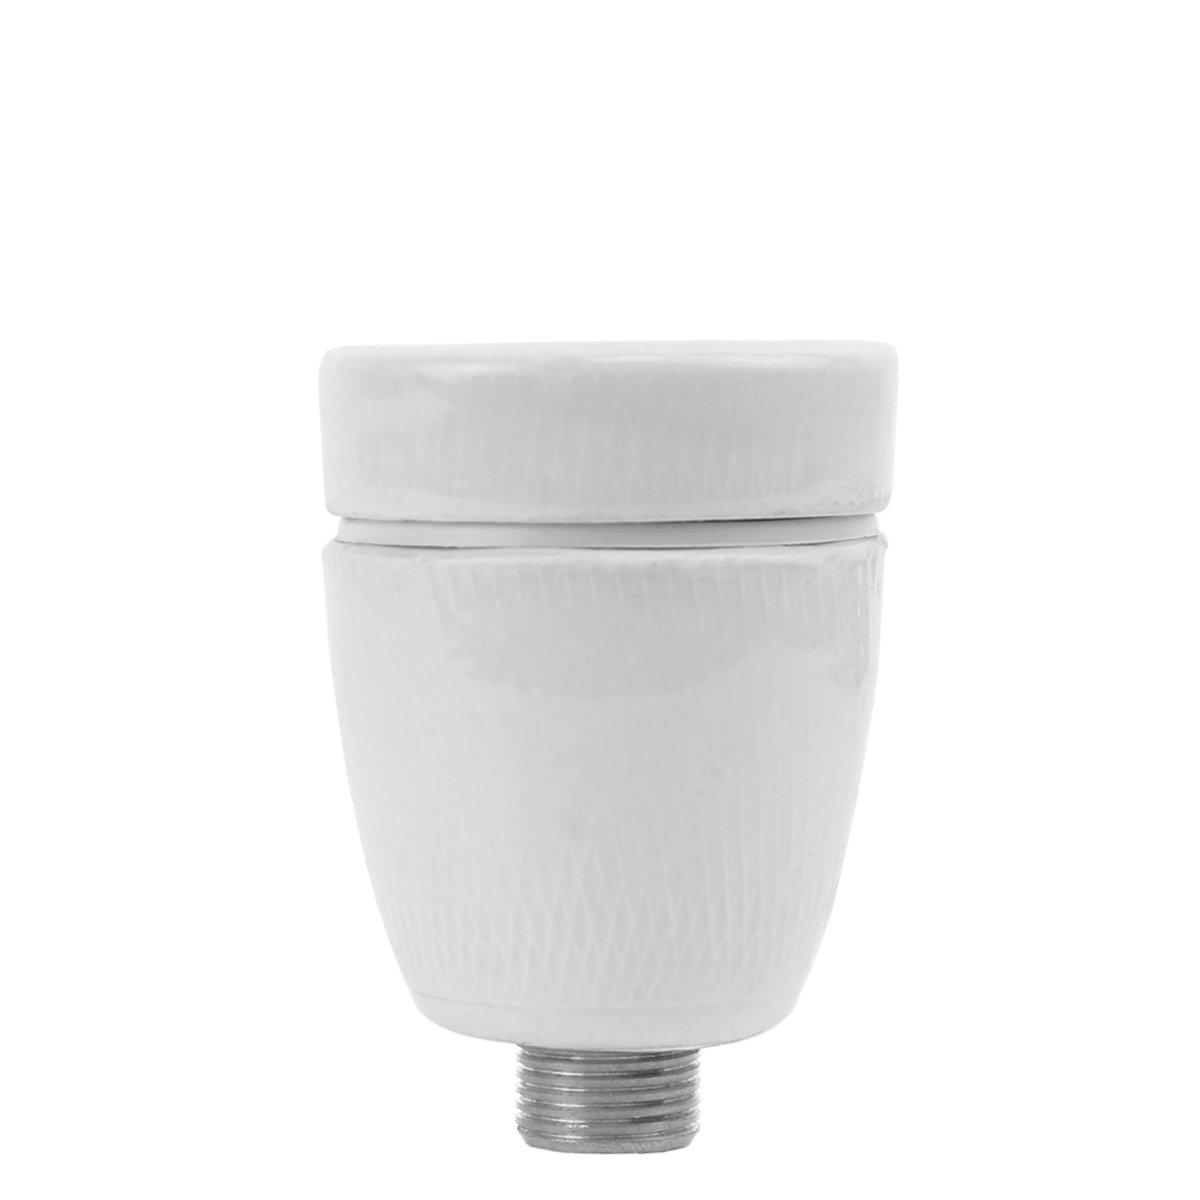 Buitenverlichting Onderdelen Losse porseleinen lamphouder E27 - Ø 10 mm